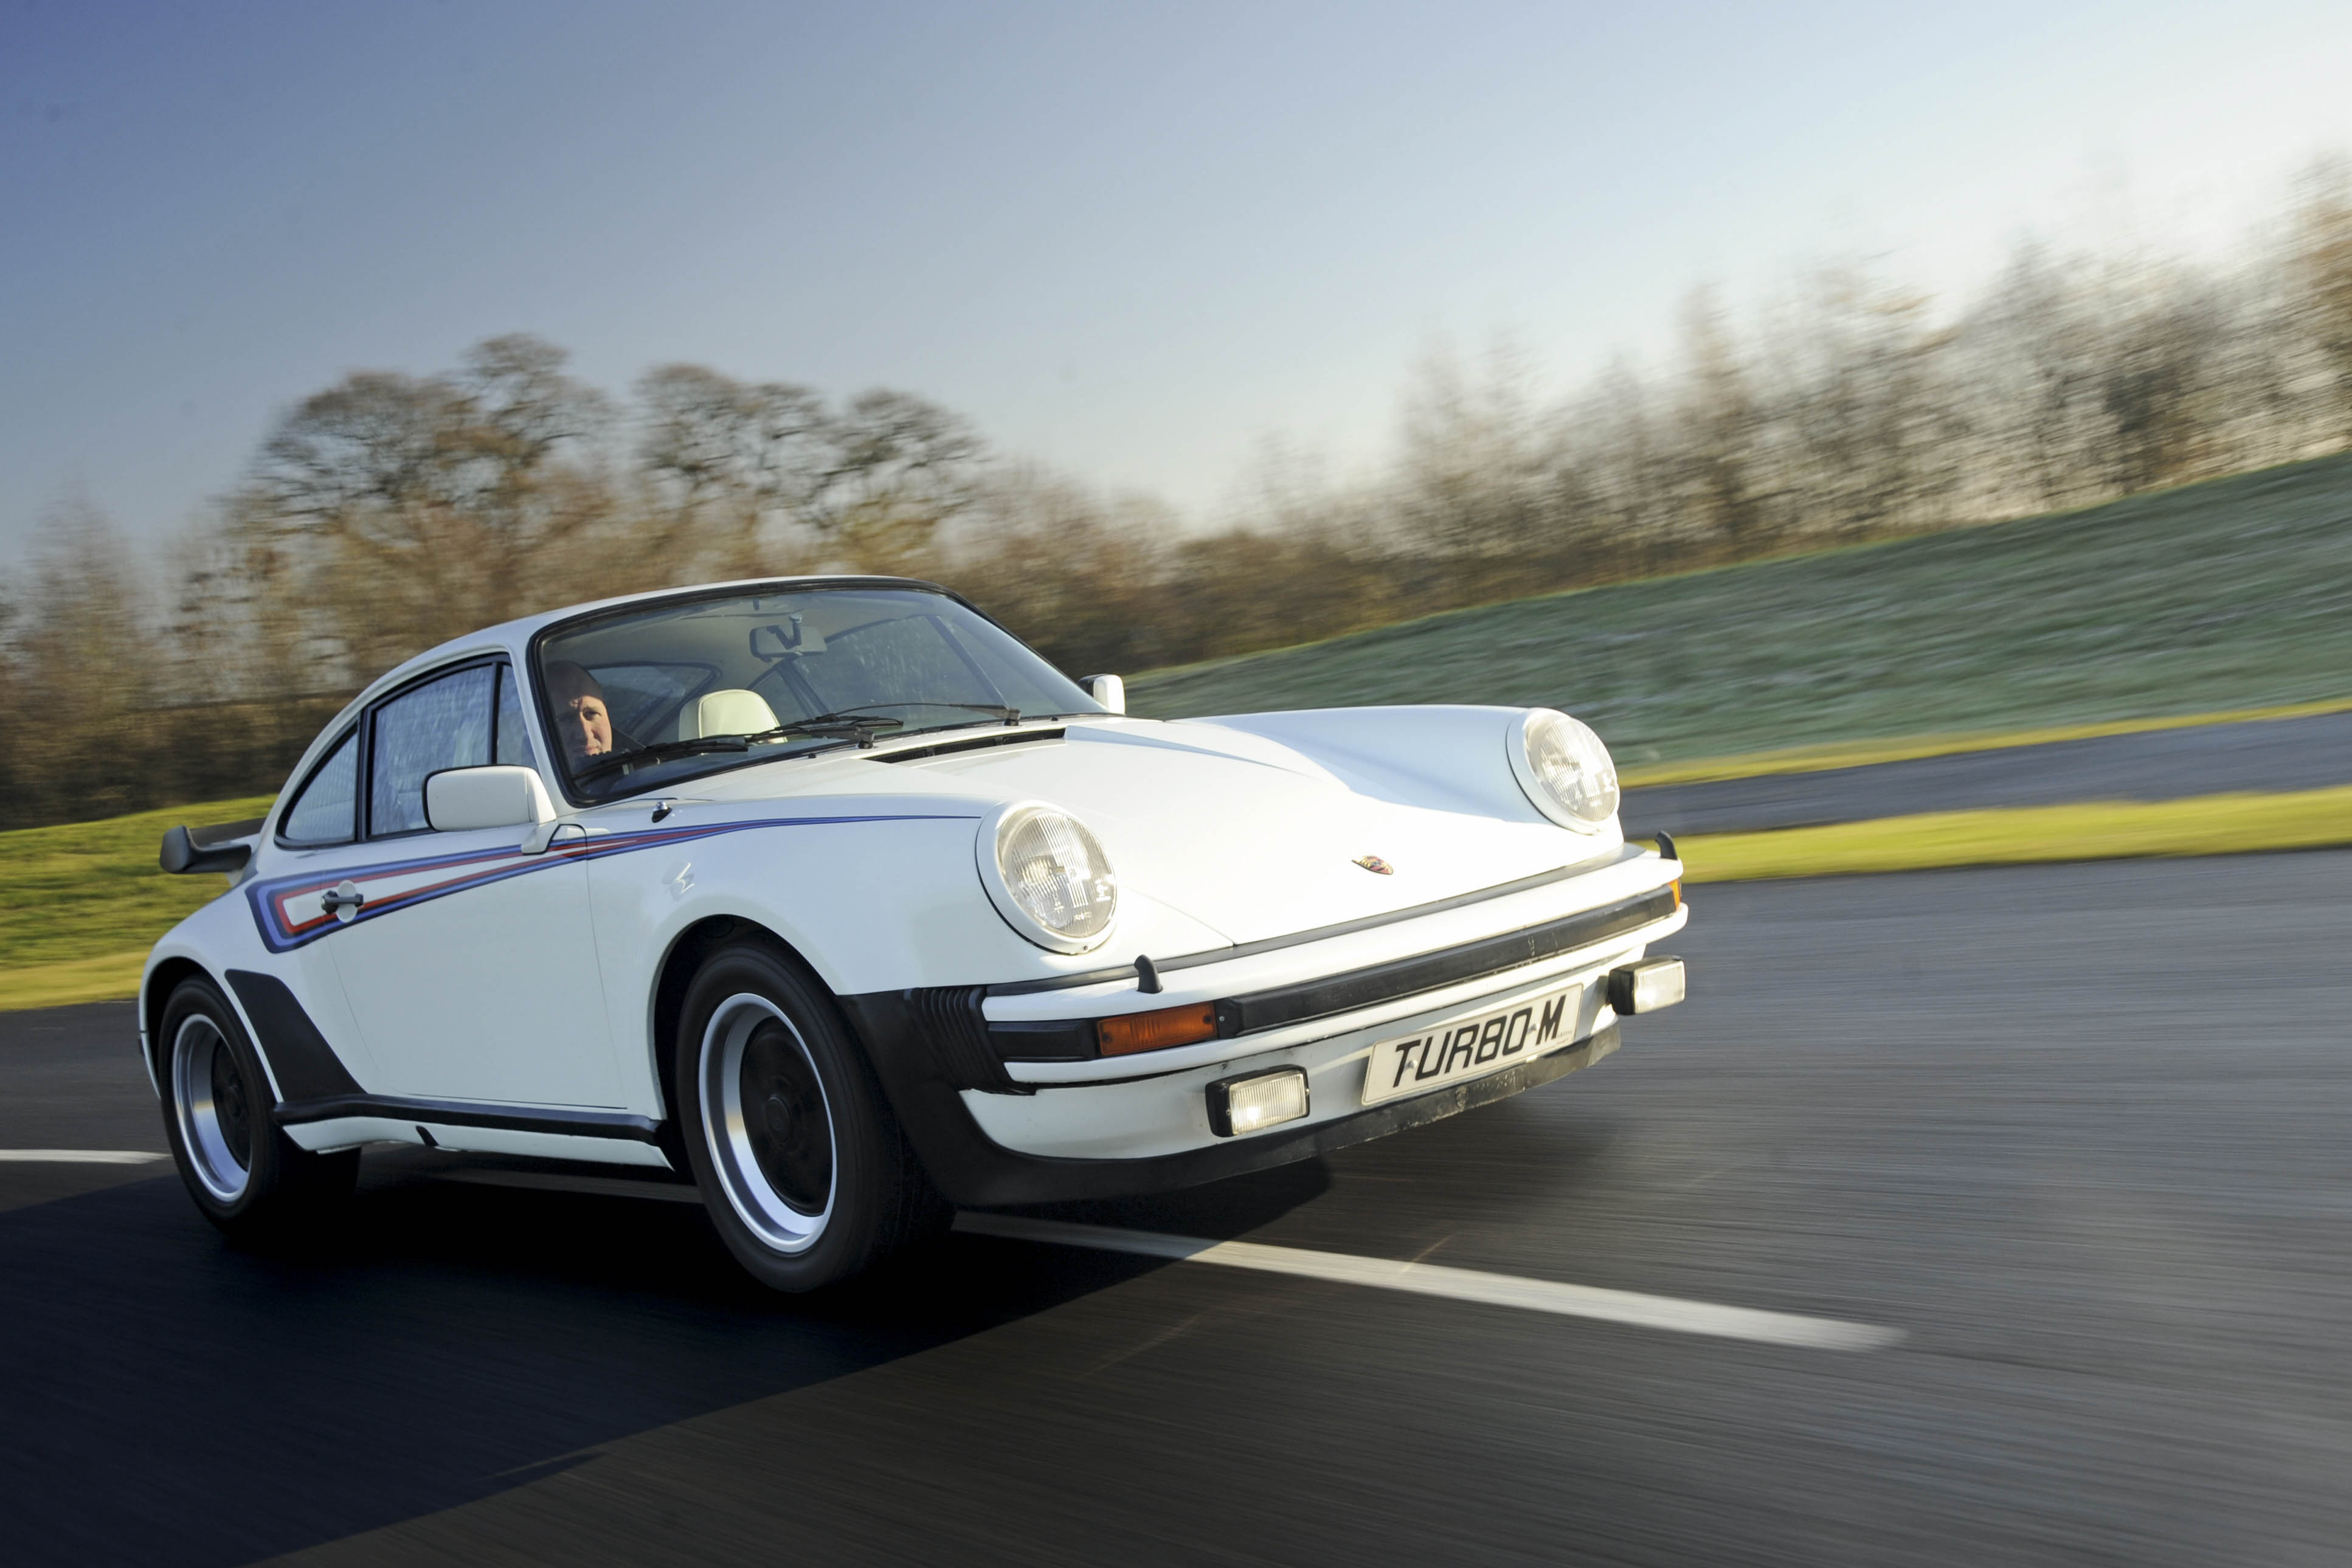 Porsche 911 Turbo Martini Auto Express